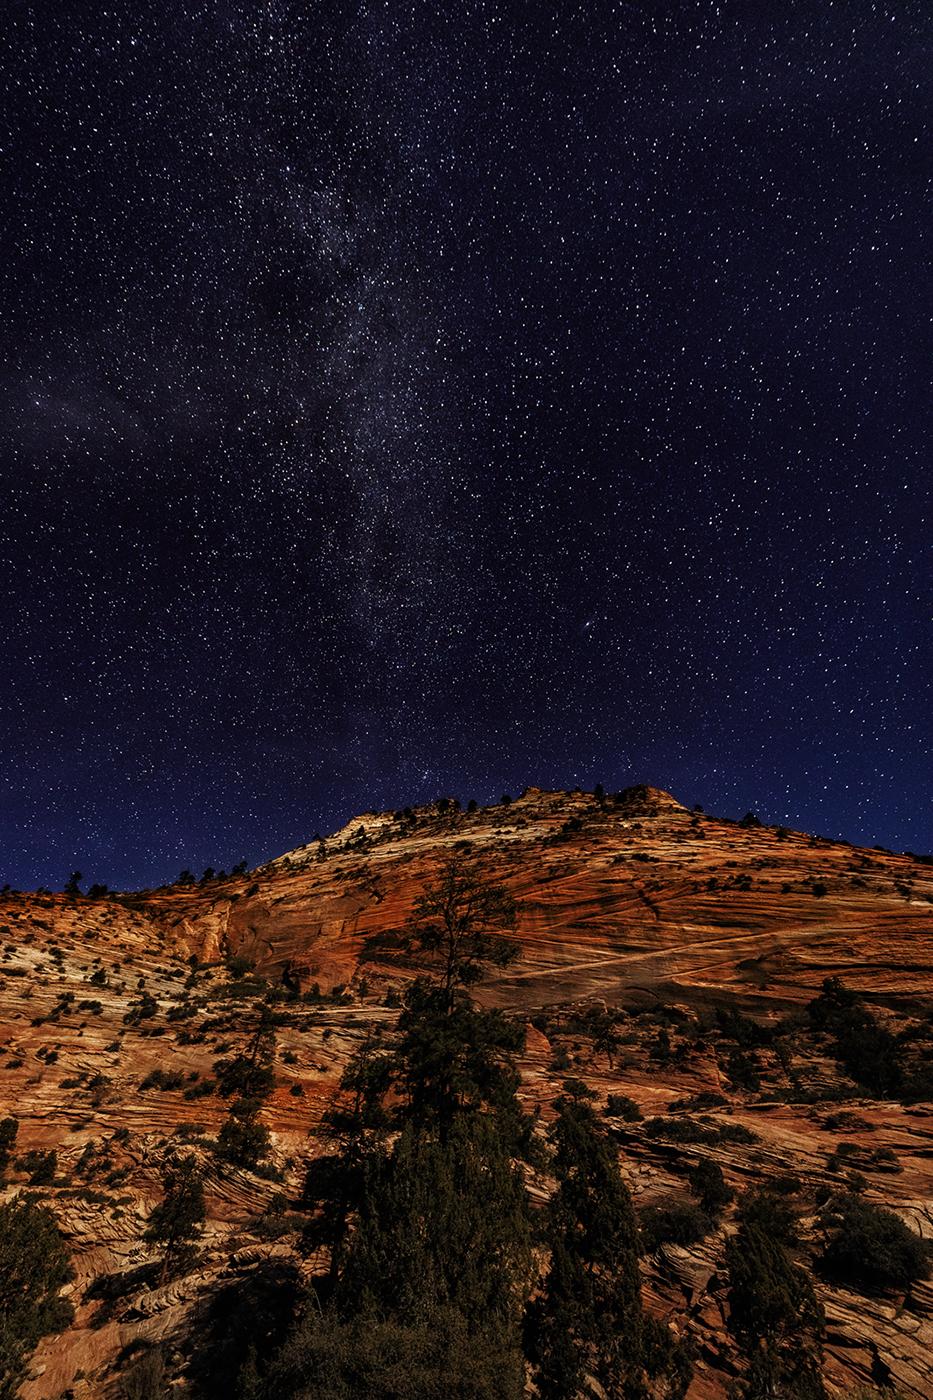 Mt. Carmel Highway, Zion National Park, Utah